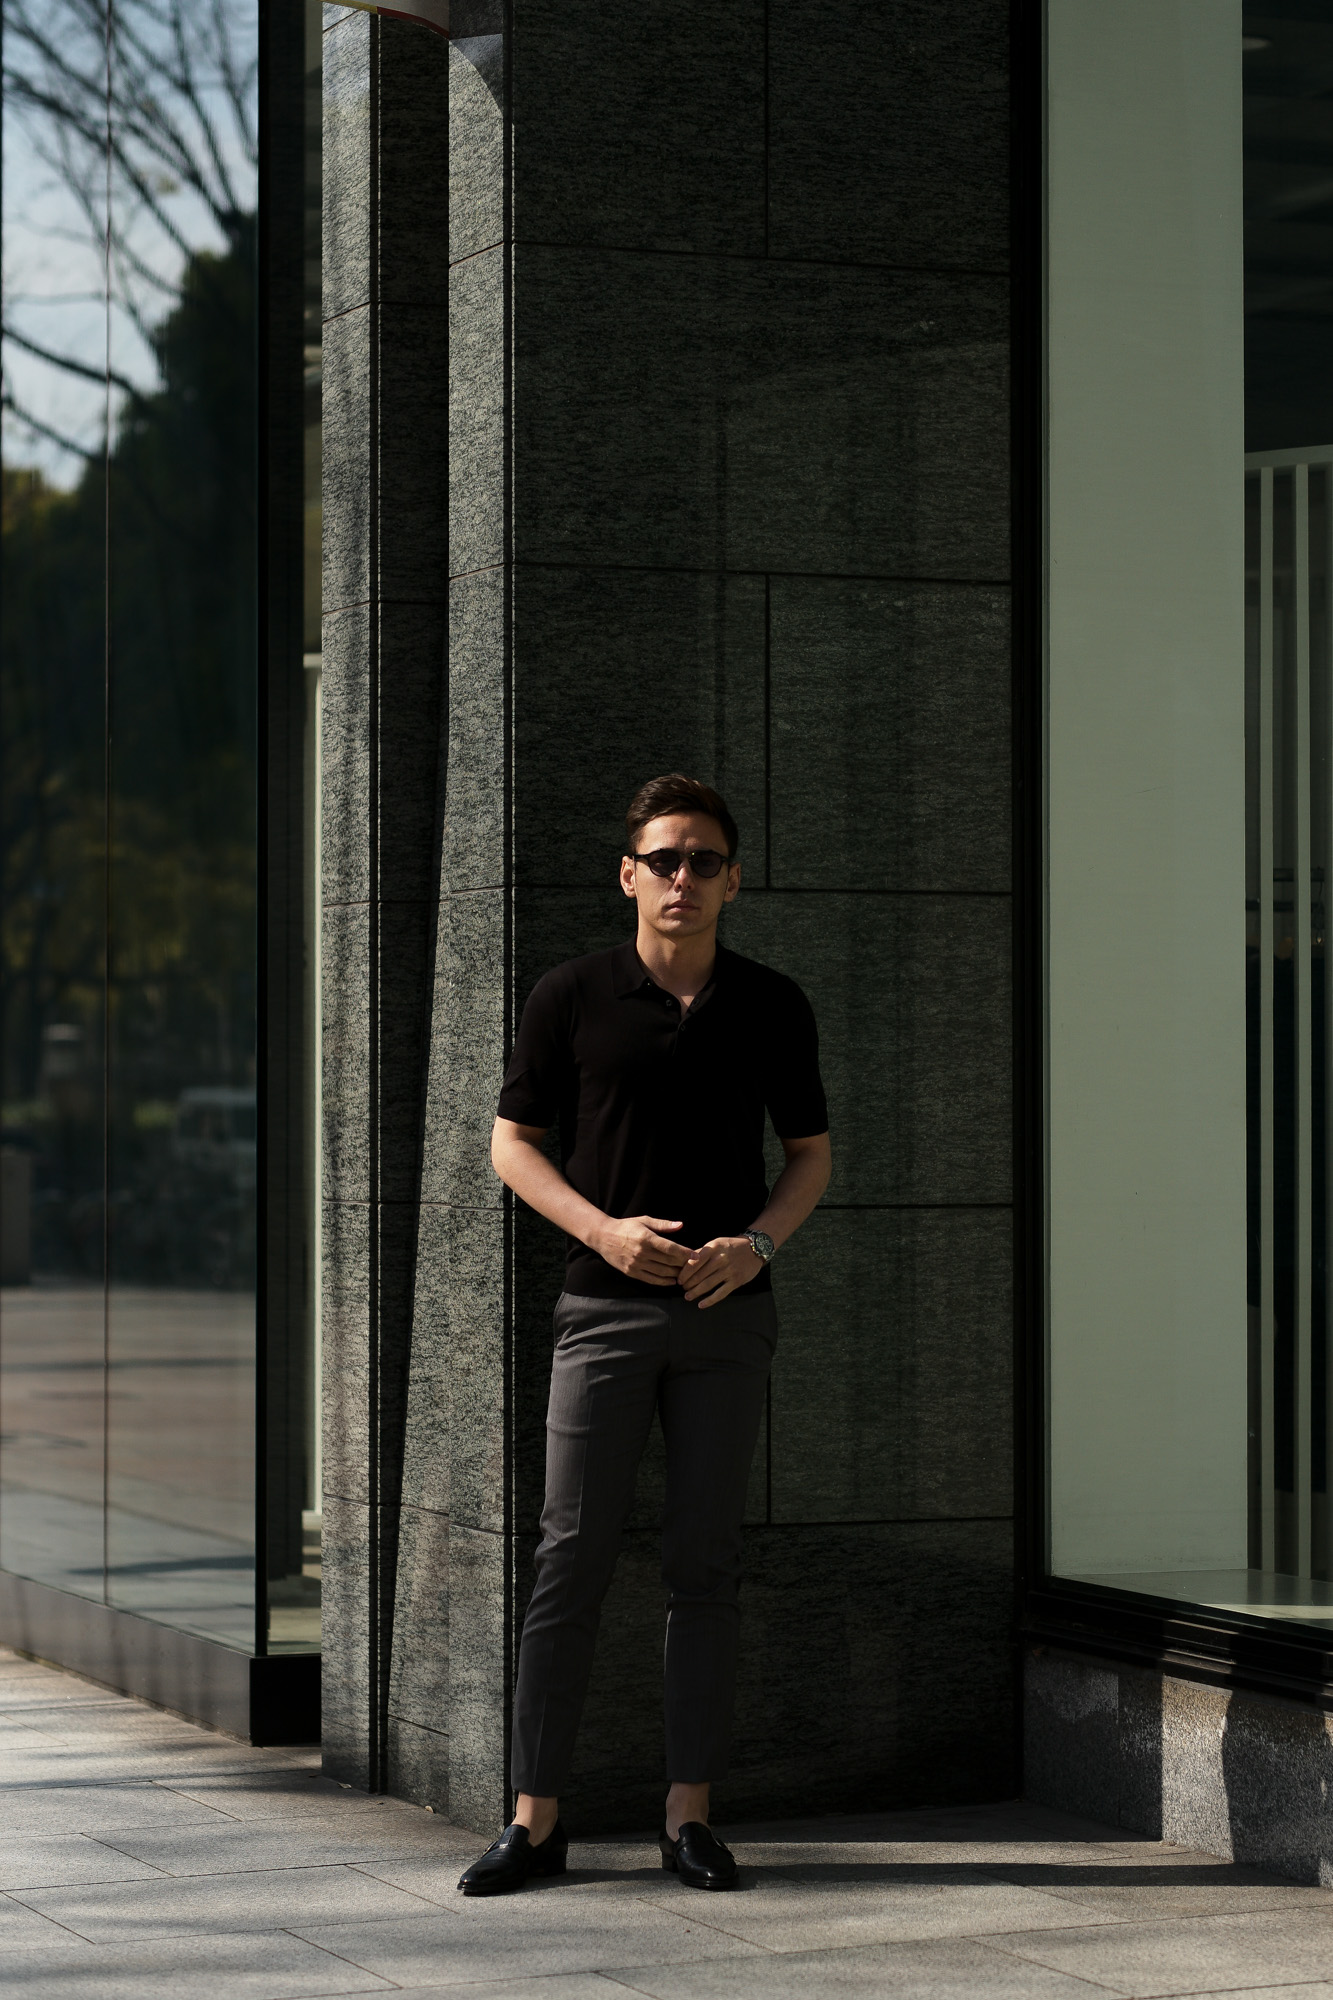 Gran Sasso (グランサッソ) Silk Knit Polo Shirt (シルクニットポロシャツ) SETA (シルク 100%) シルク ニット ポロシャツ BLACK (ブラック・099) made in italy (イタリア製) 2020 春夏新作  愛知 名古屋 altoediritto アルトエデリット